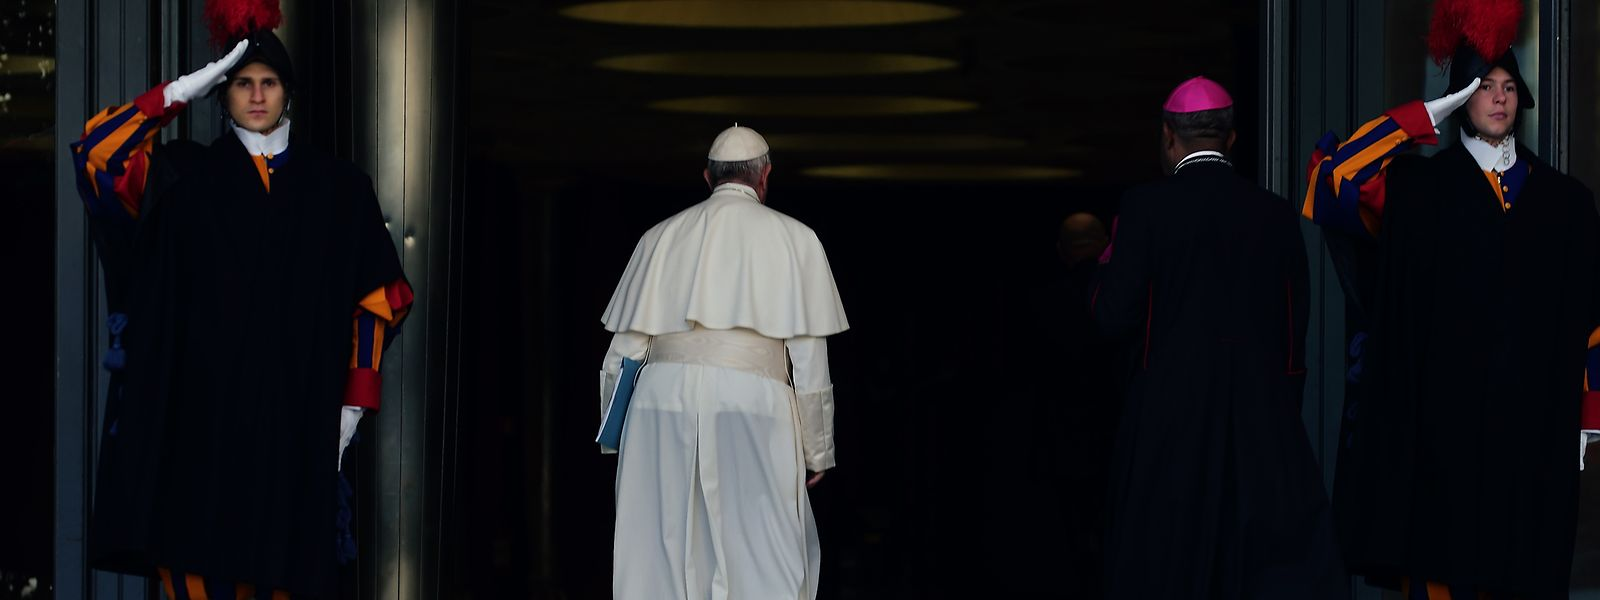 Papst Franziskus kommt zum Gipfeltreffen zum Thema Missbrauch im Vatikan.